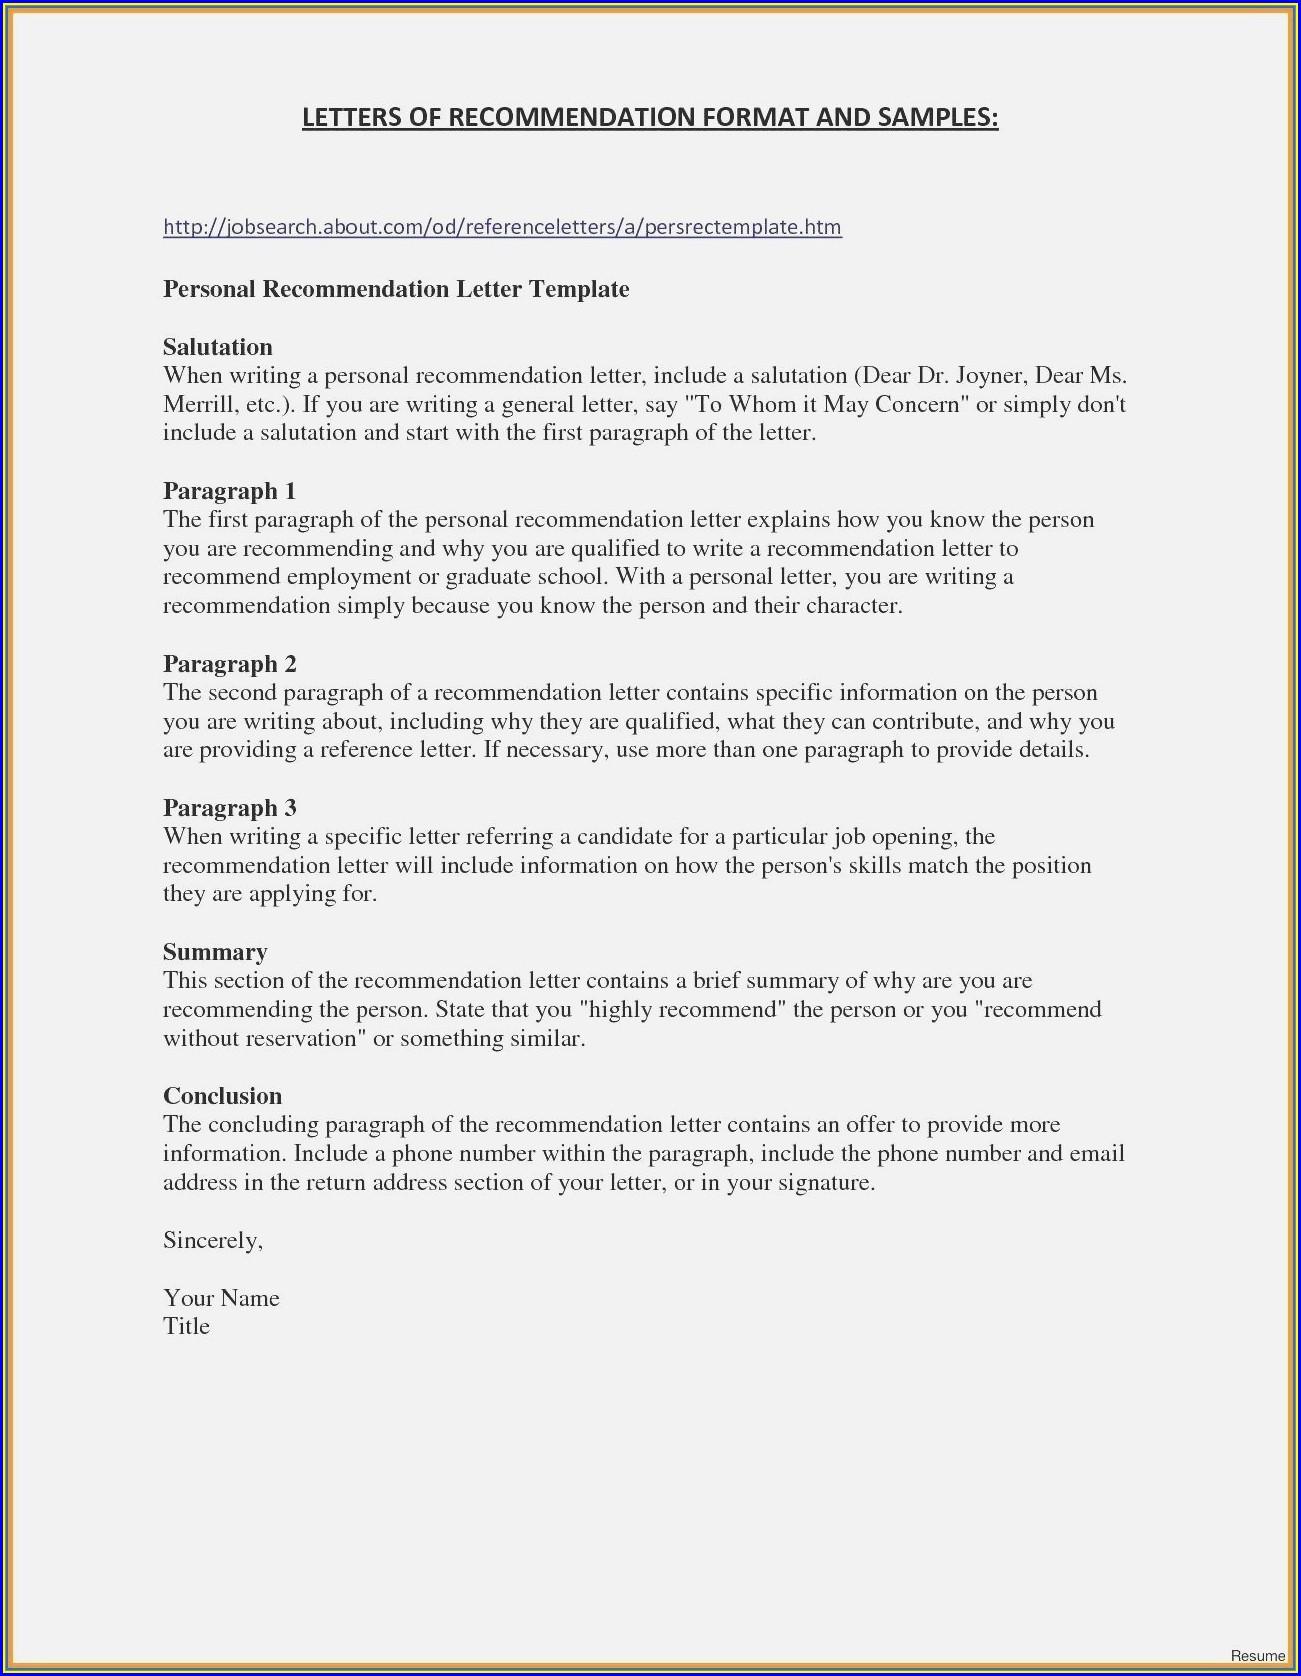 Resume Format Construction Worker